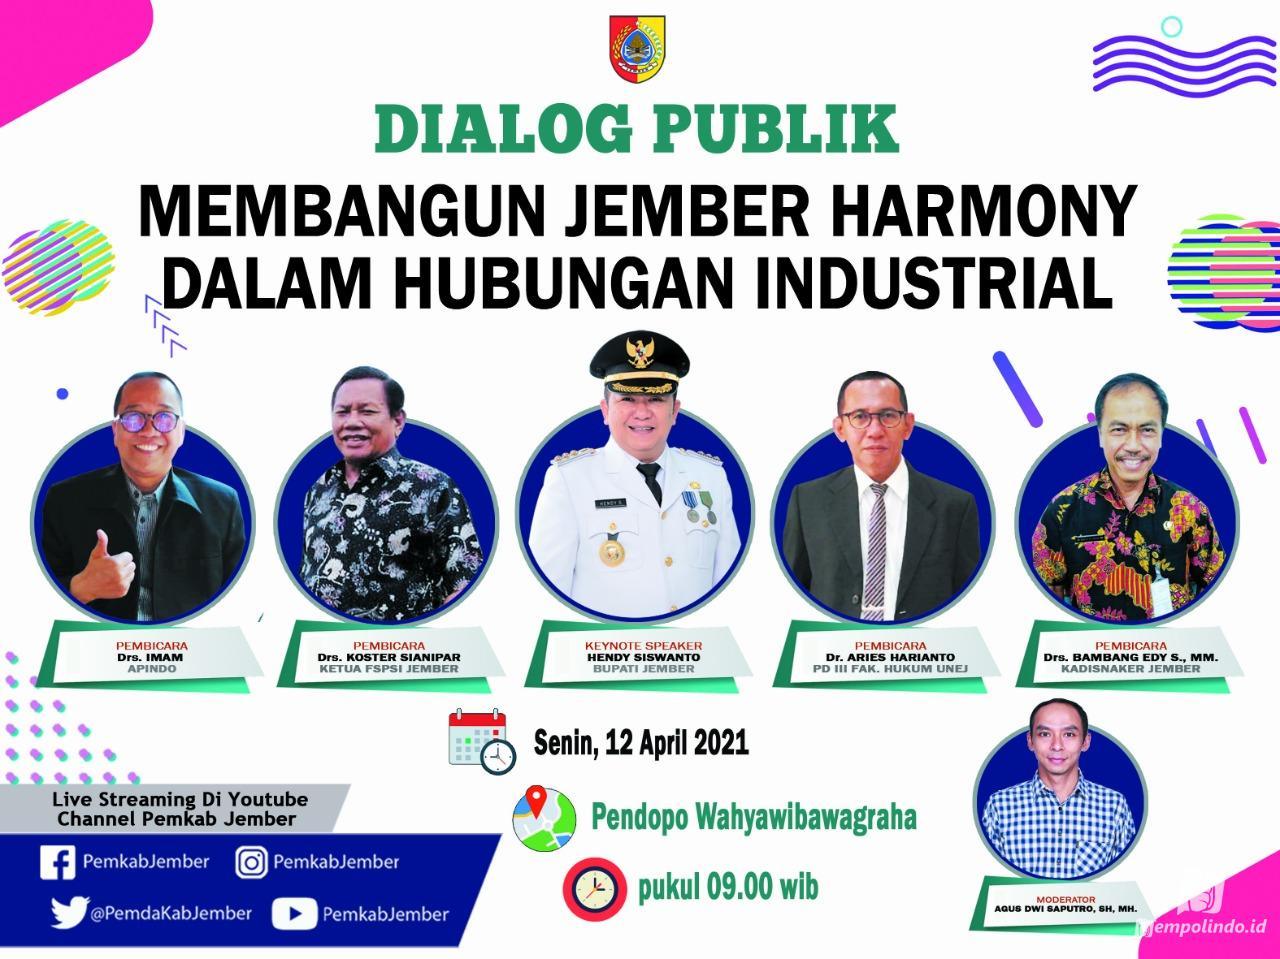 dialog publik membangun jember harmoni